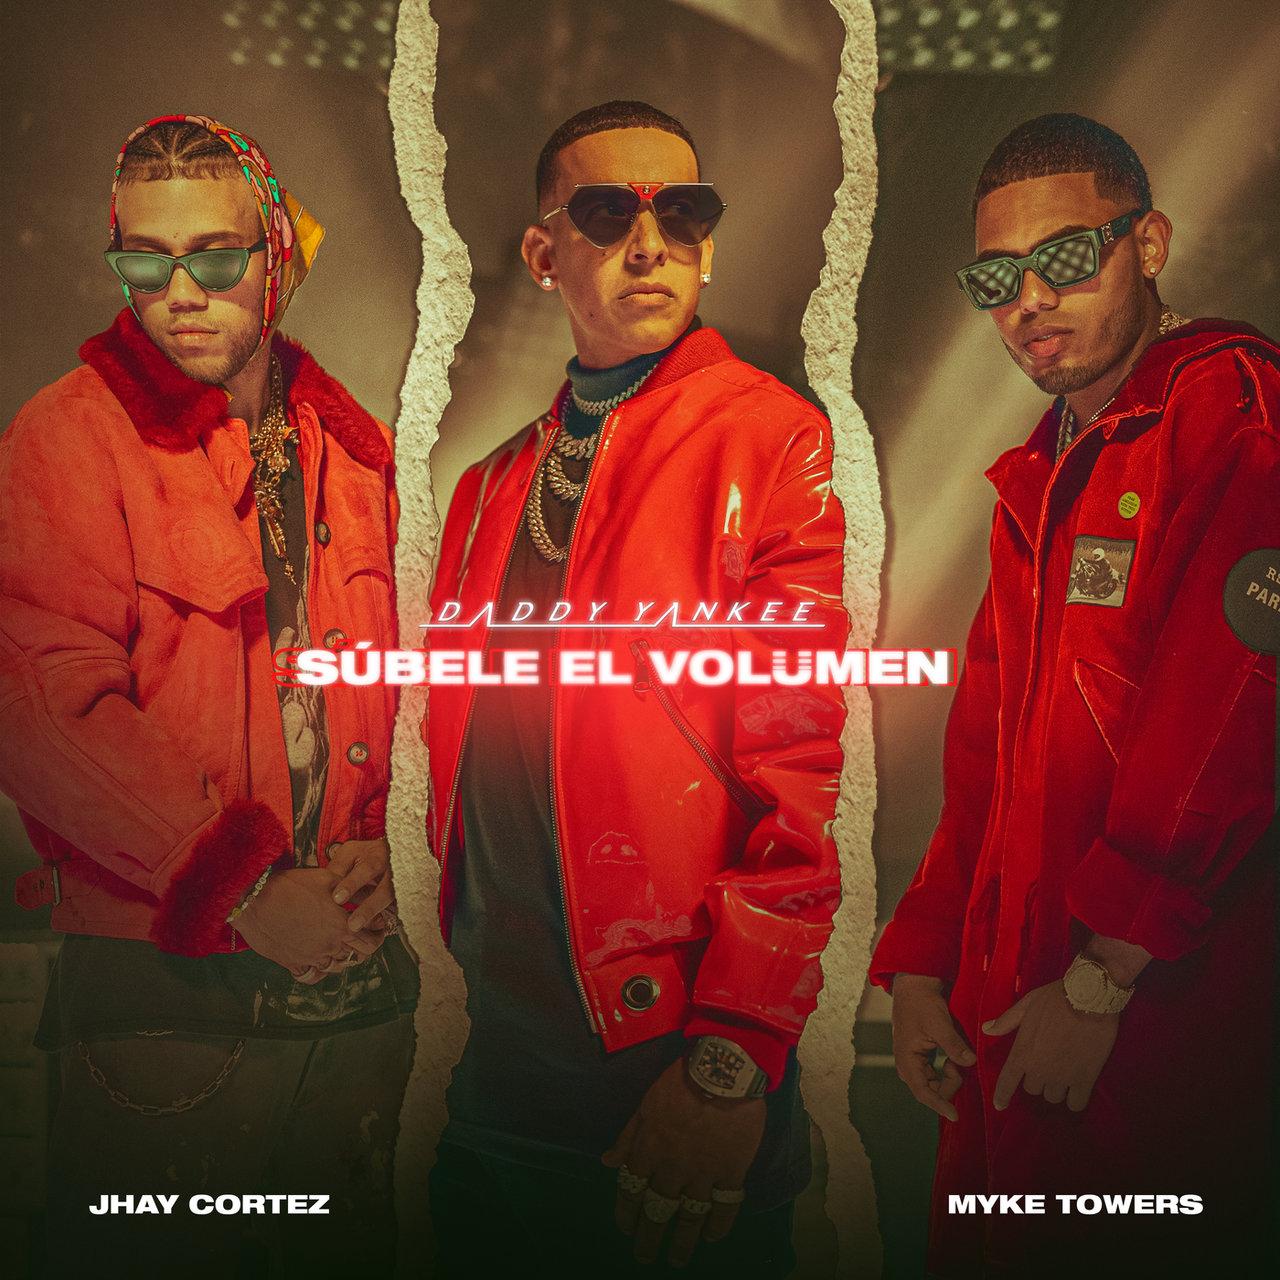 Daddy Yankee - Súbele El Volumen (ft. Myke Towers and Jhay Cortez) (Cover)